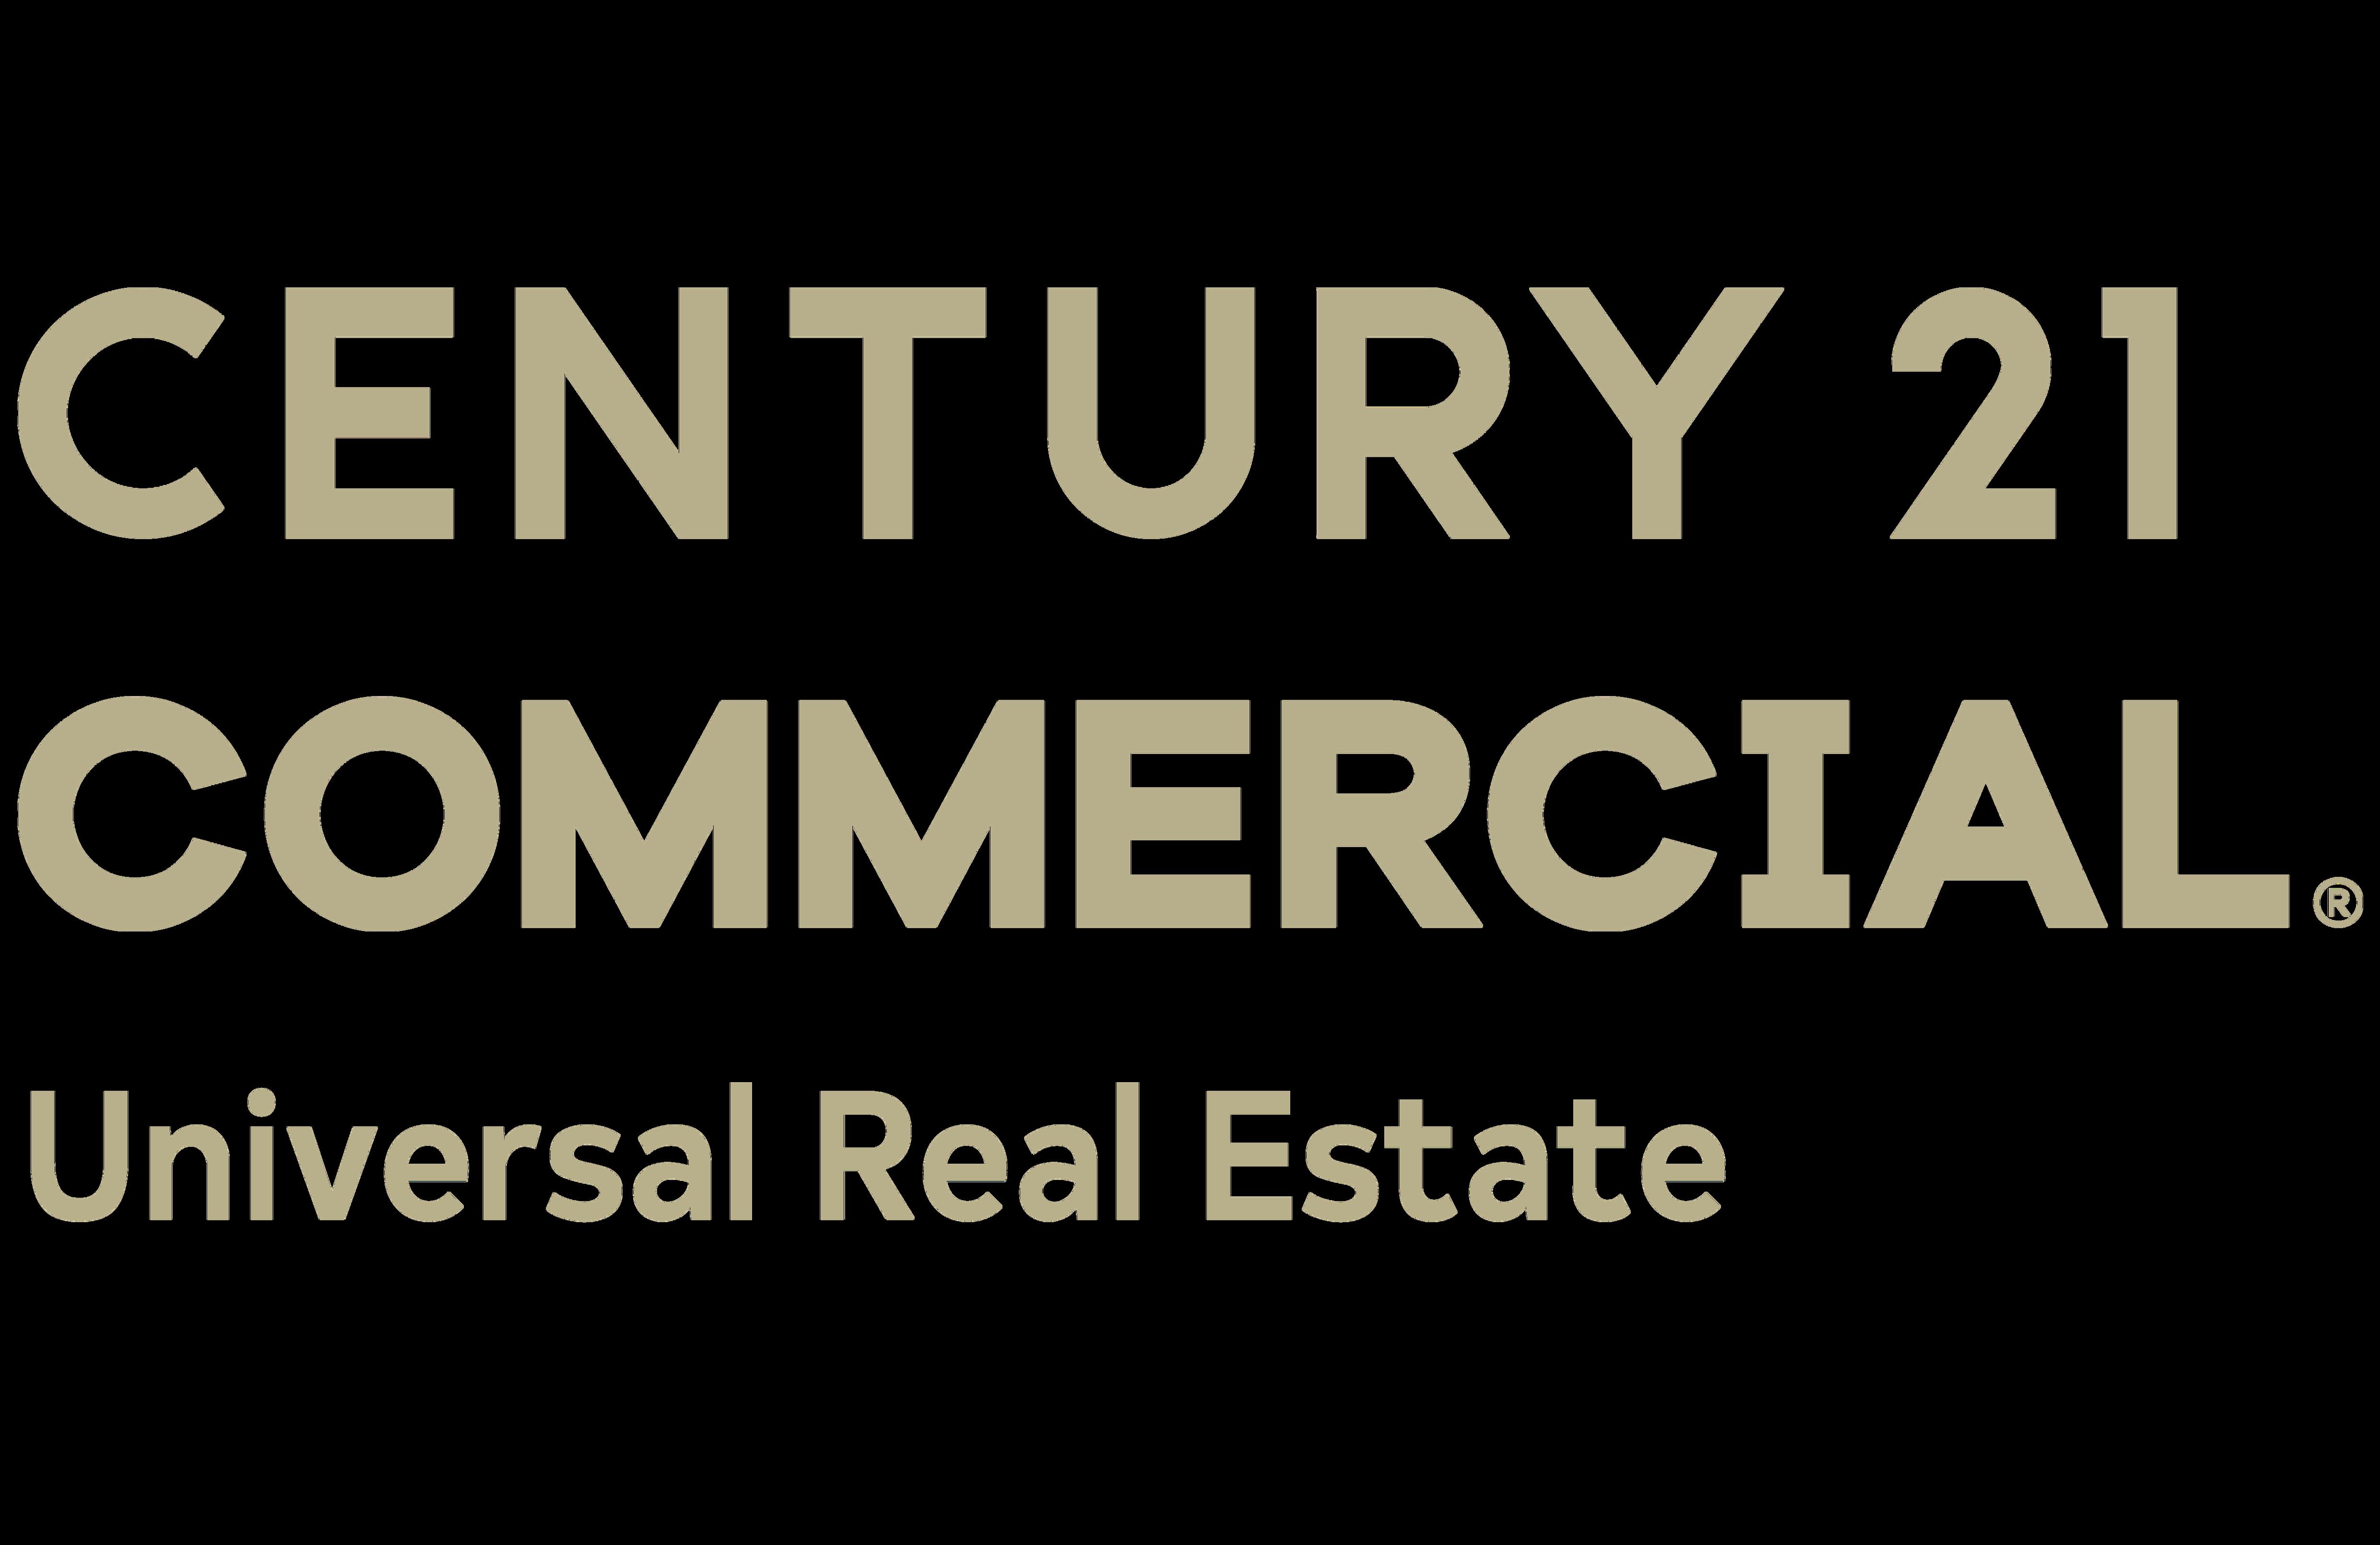 CENTURY 21 Universal Real Estate